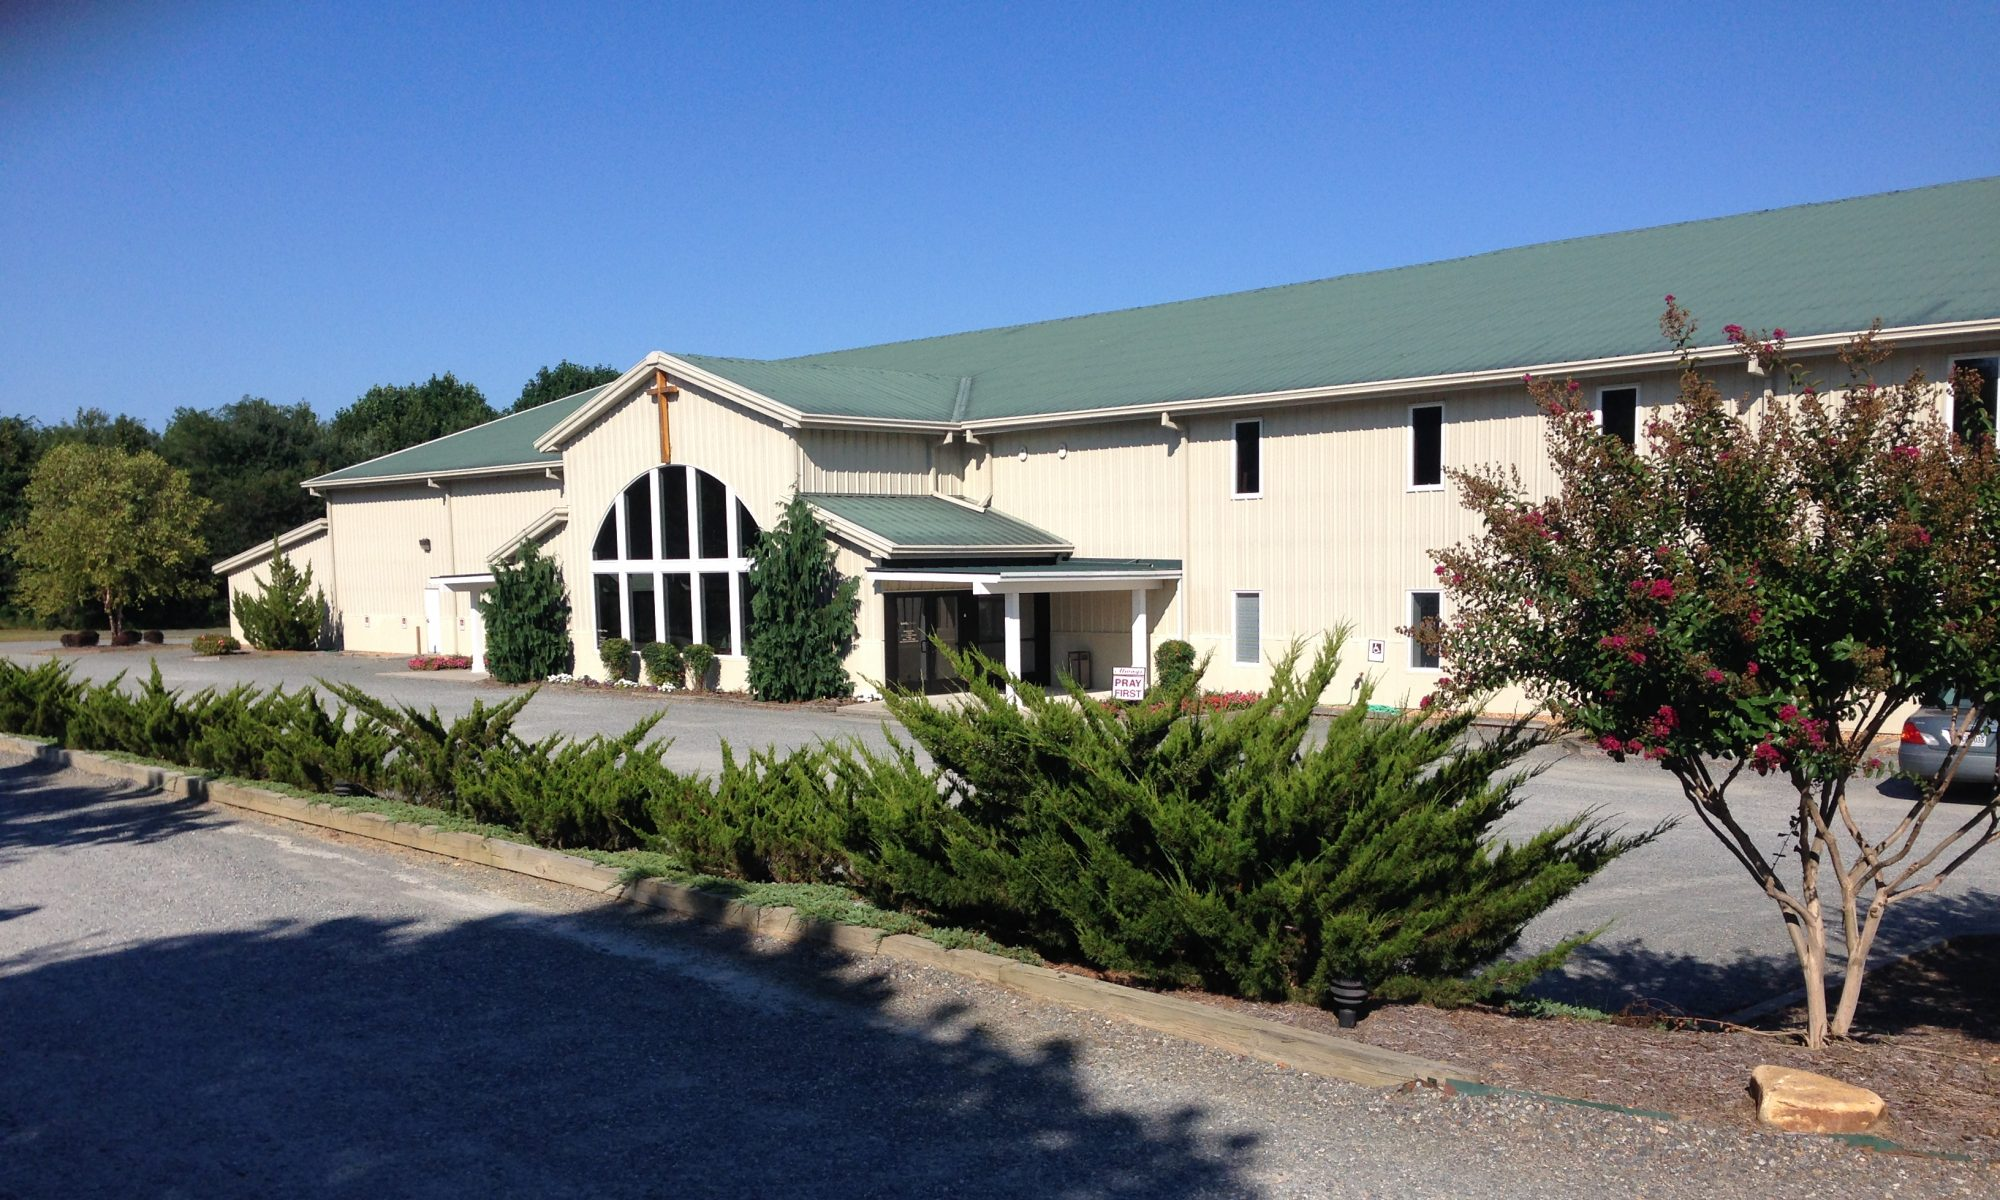 WHITE STONE CHURCH OF THE NAZARENE